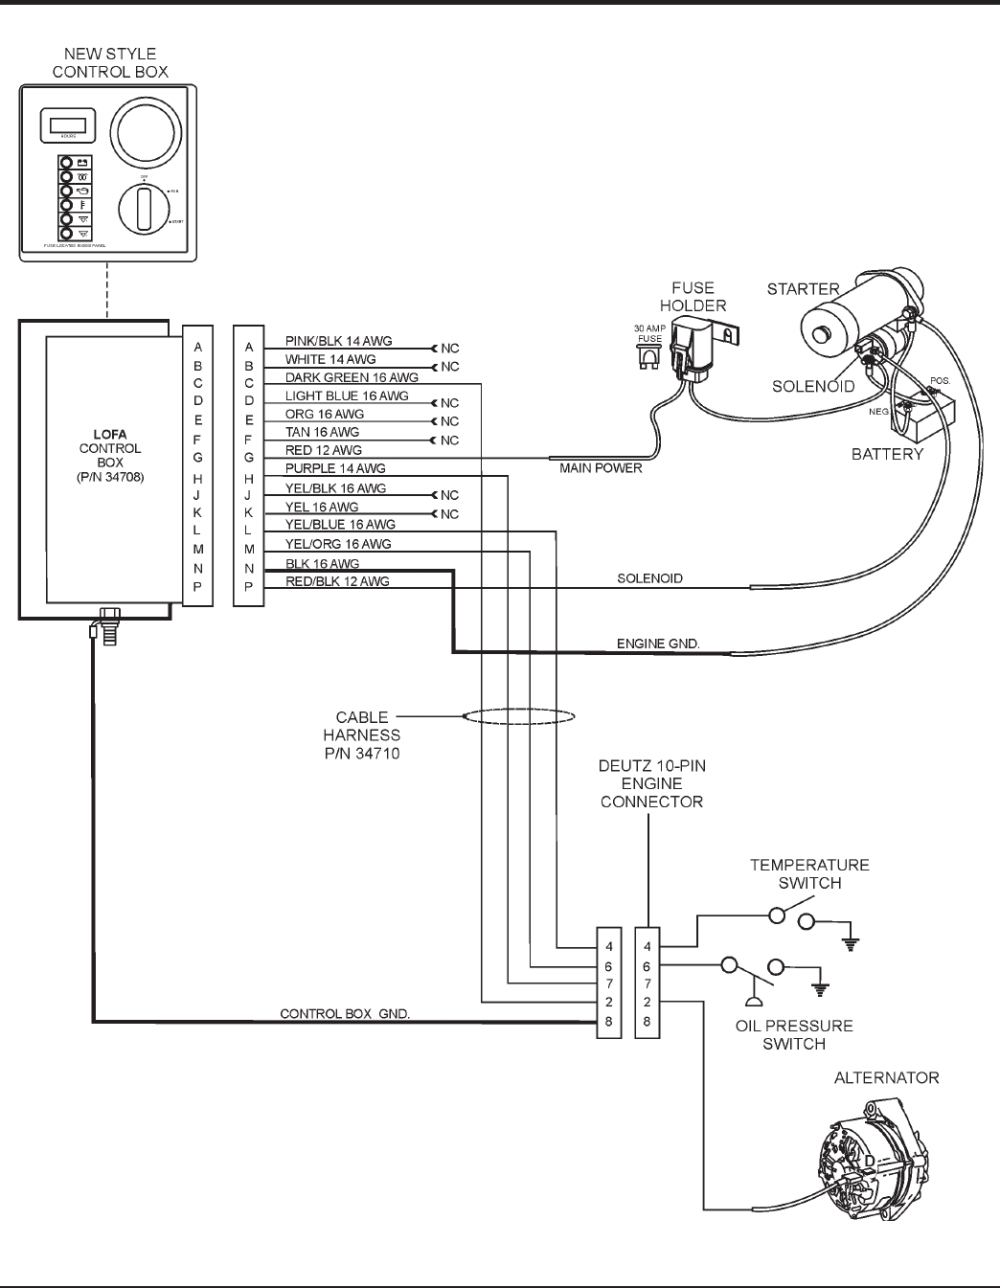 medium resolution of mq62tdd trash pump operation and parts manual rev 0 07 30 09 page 53